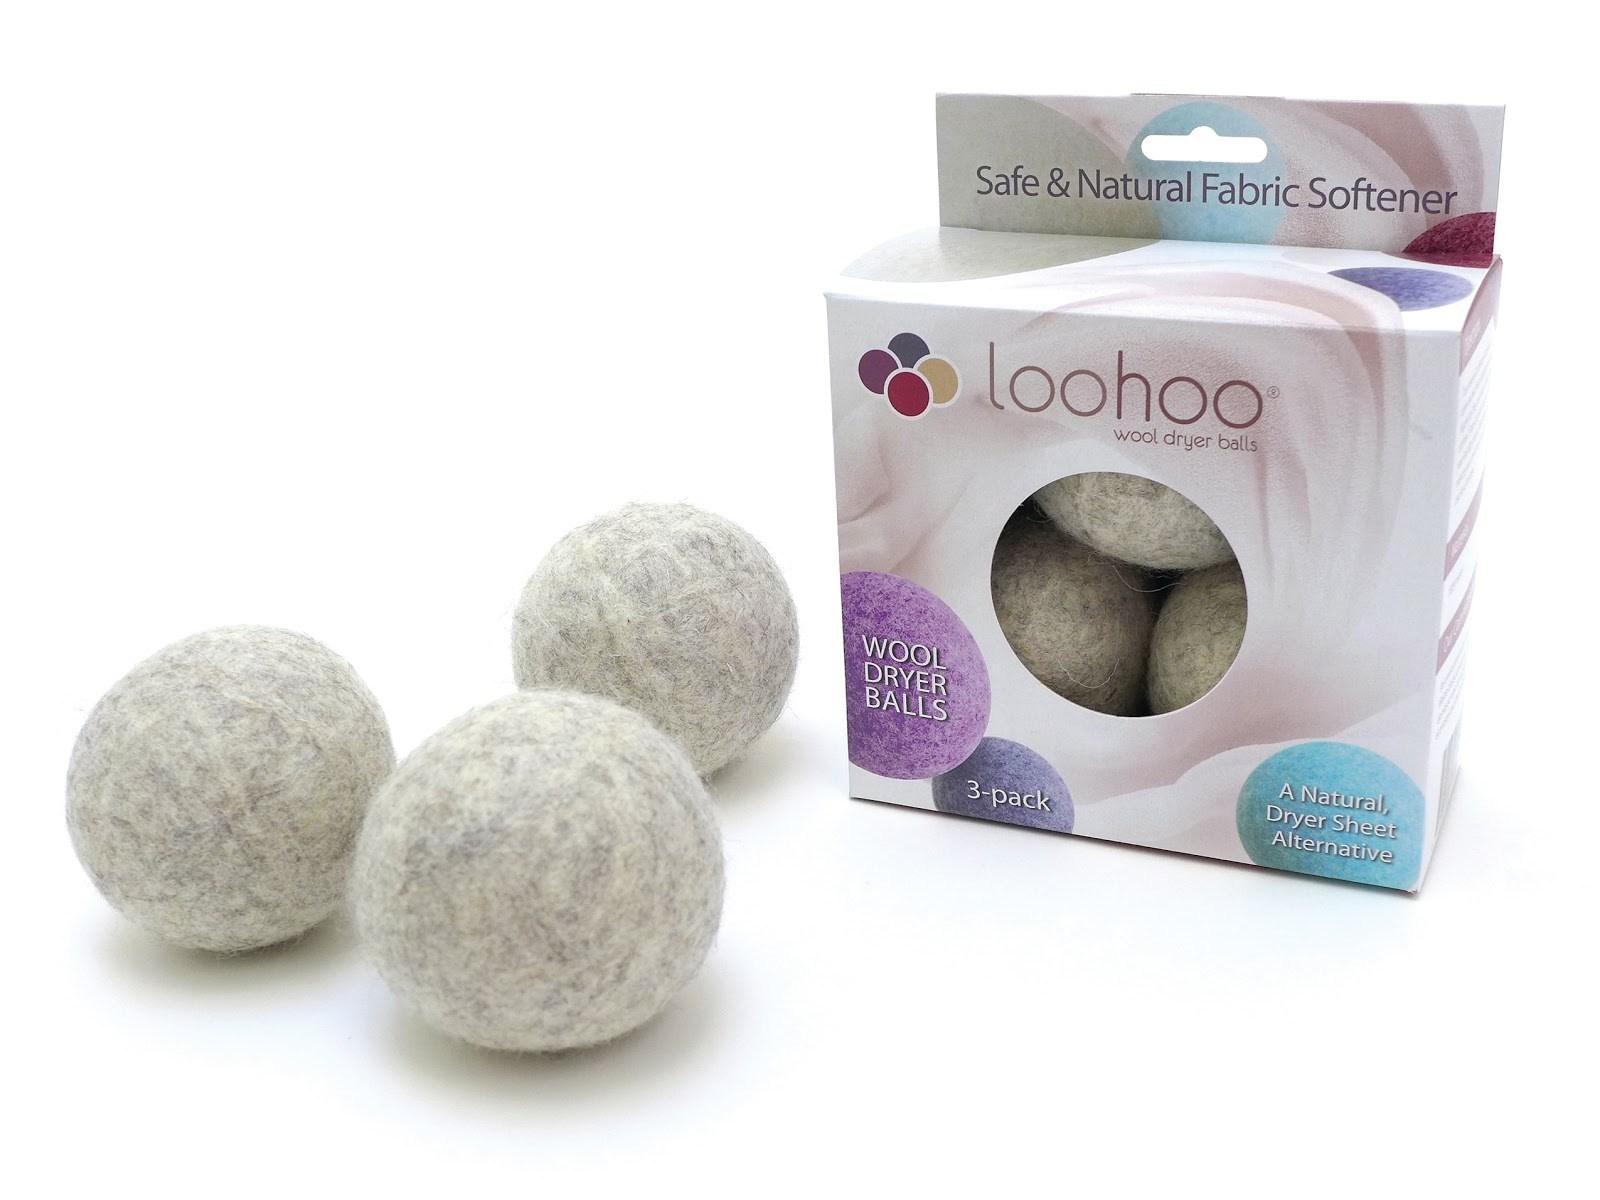 loo hoo dryer balls